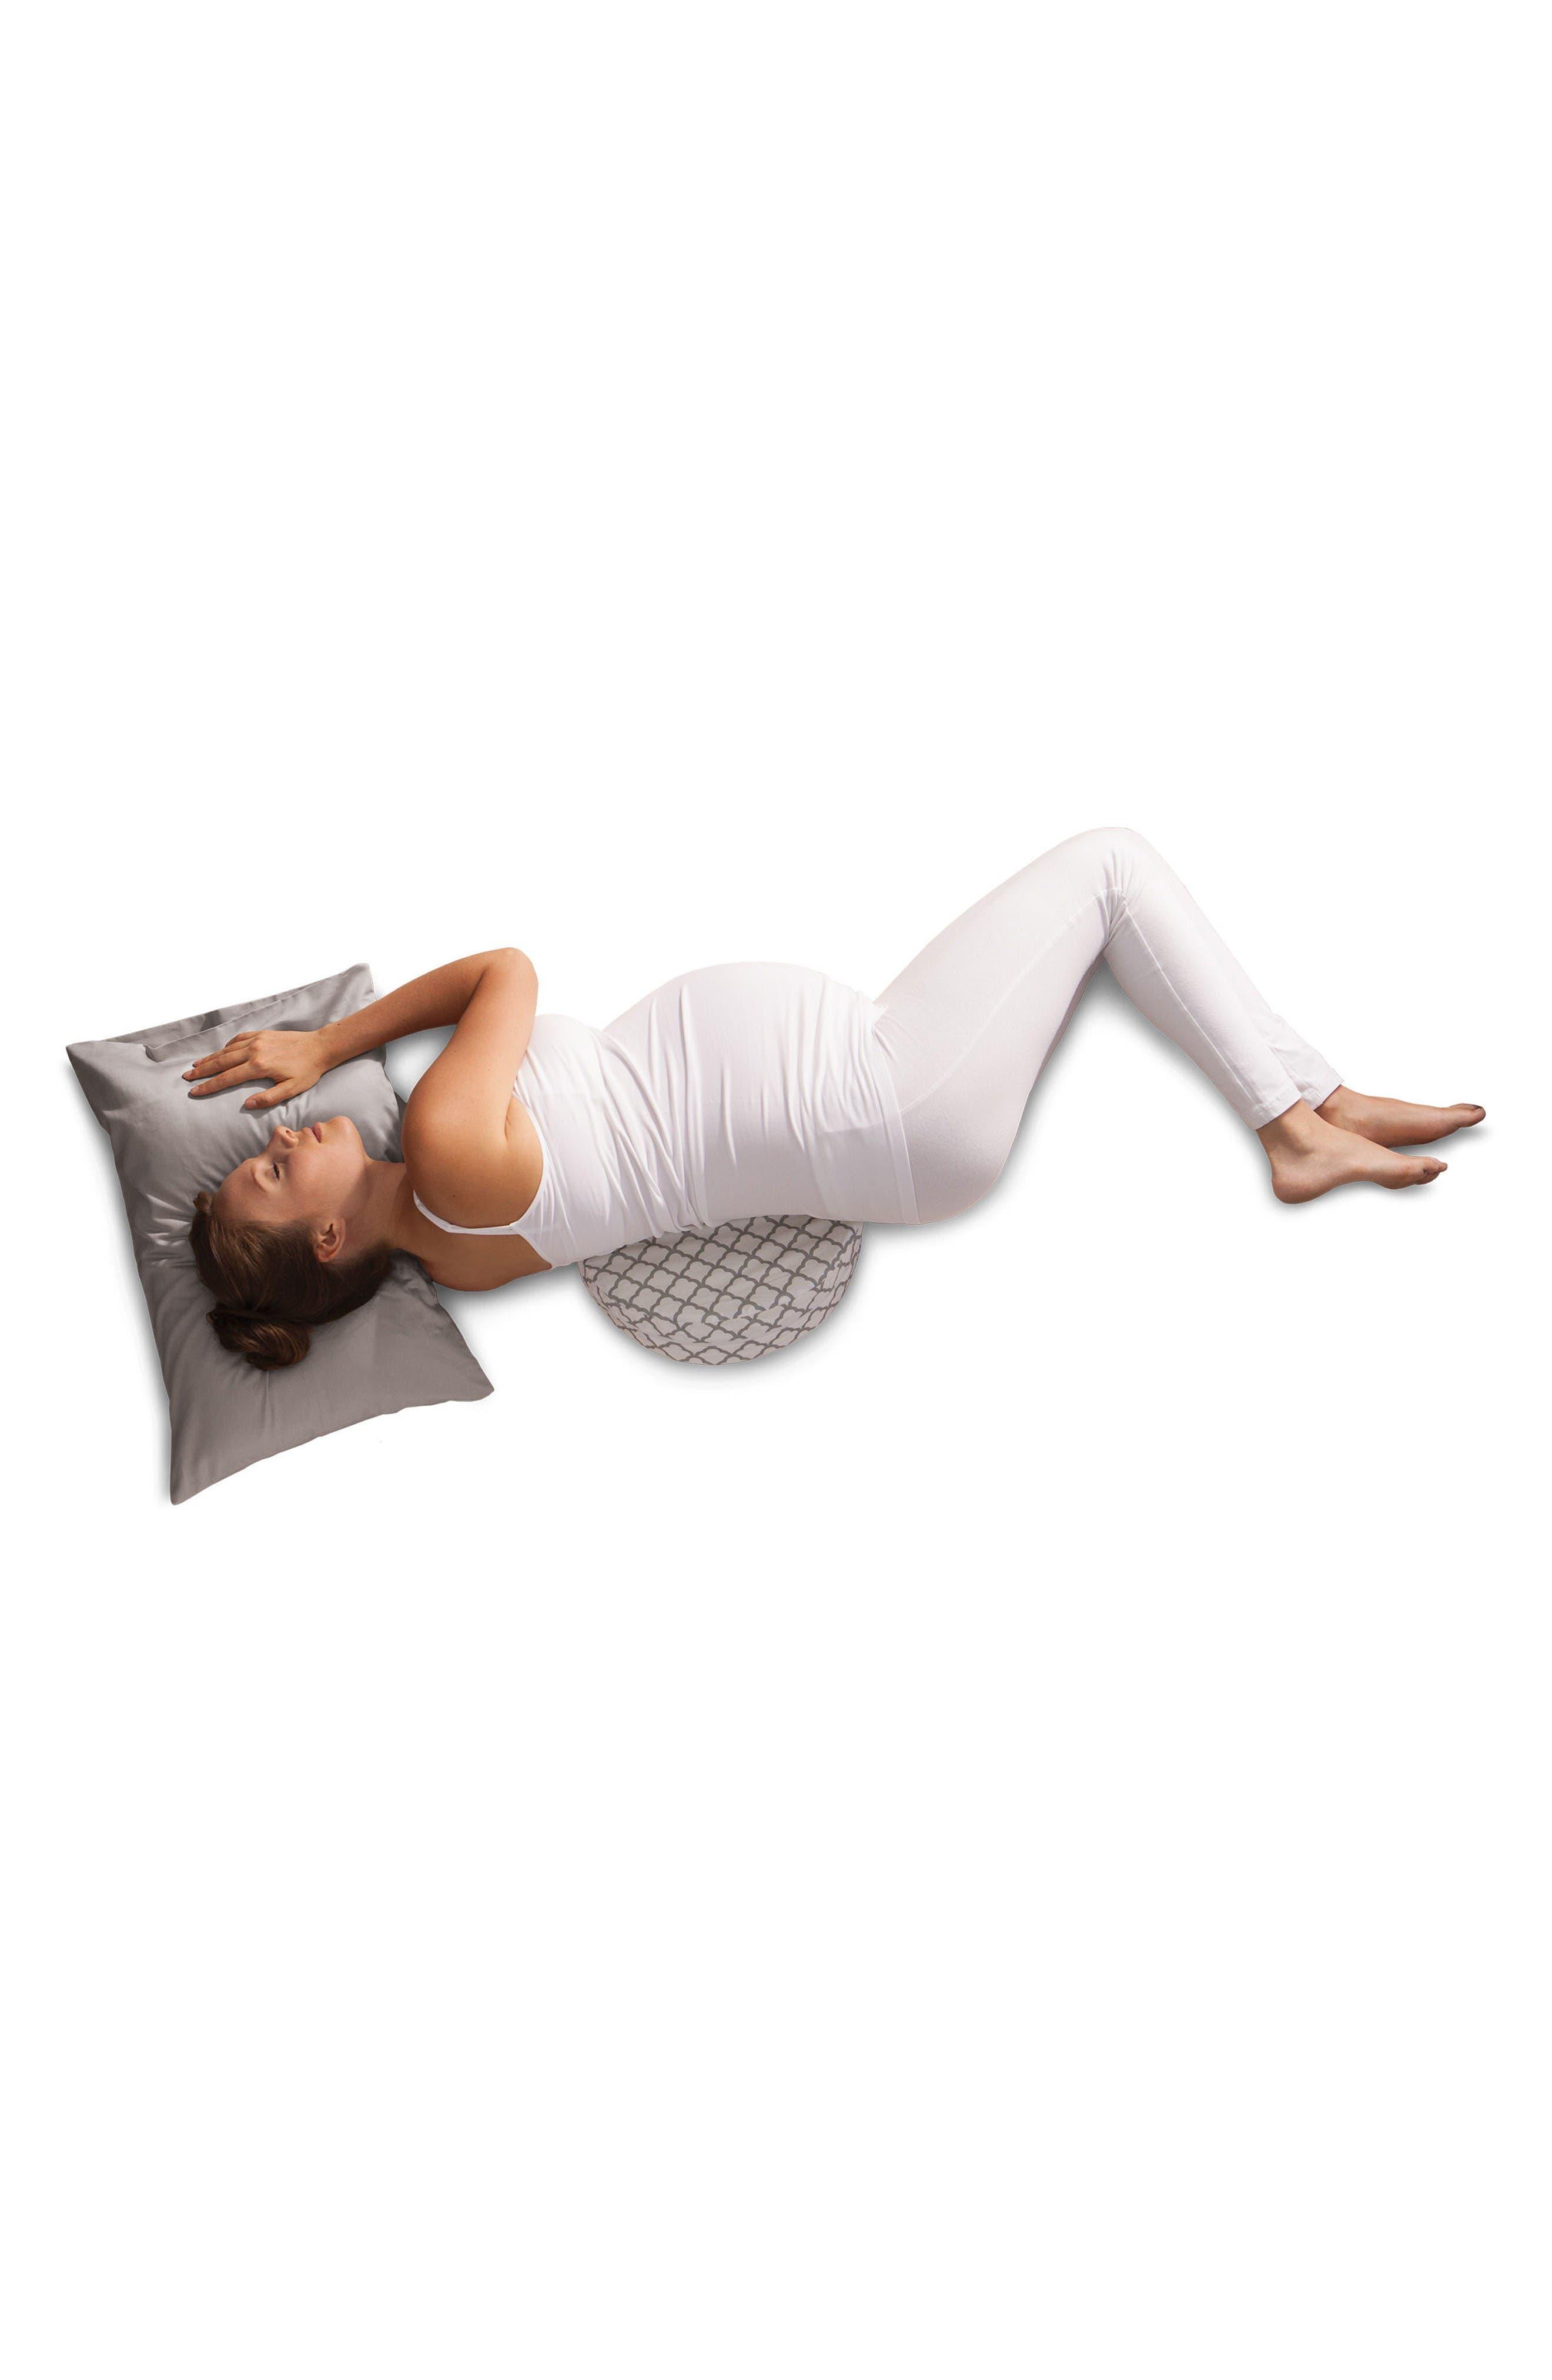 Pregnancy Wedge Cushion & Slipcover,                             Alternate thumbnail 7, color,                             White Trellis